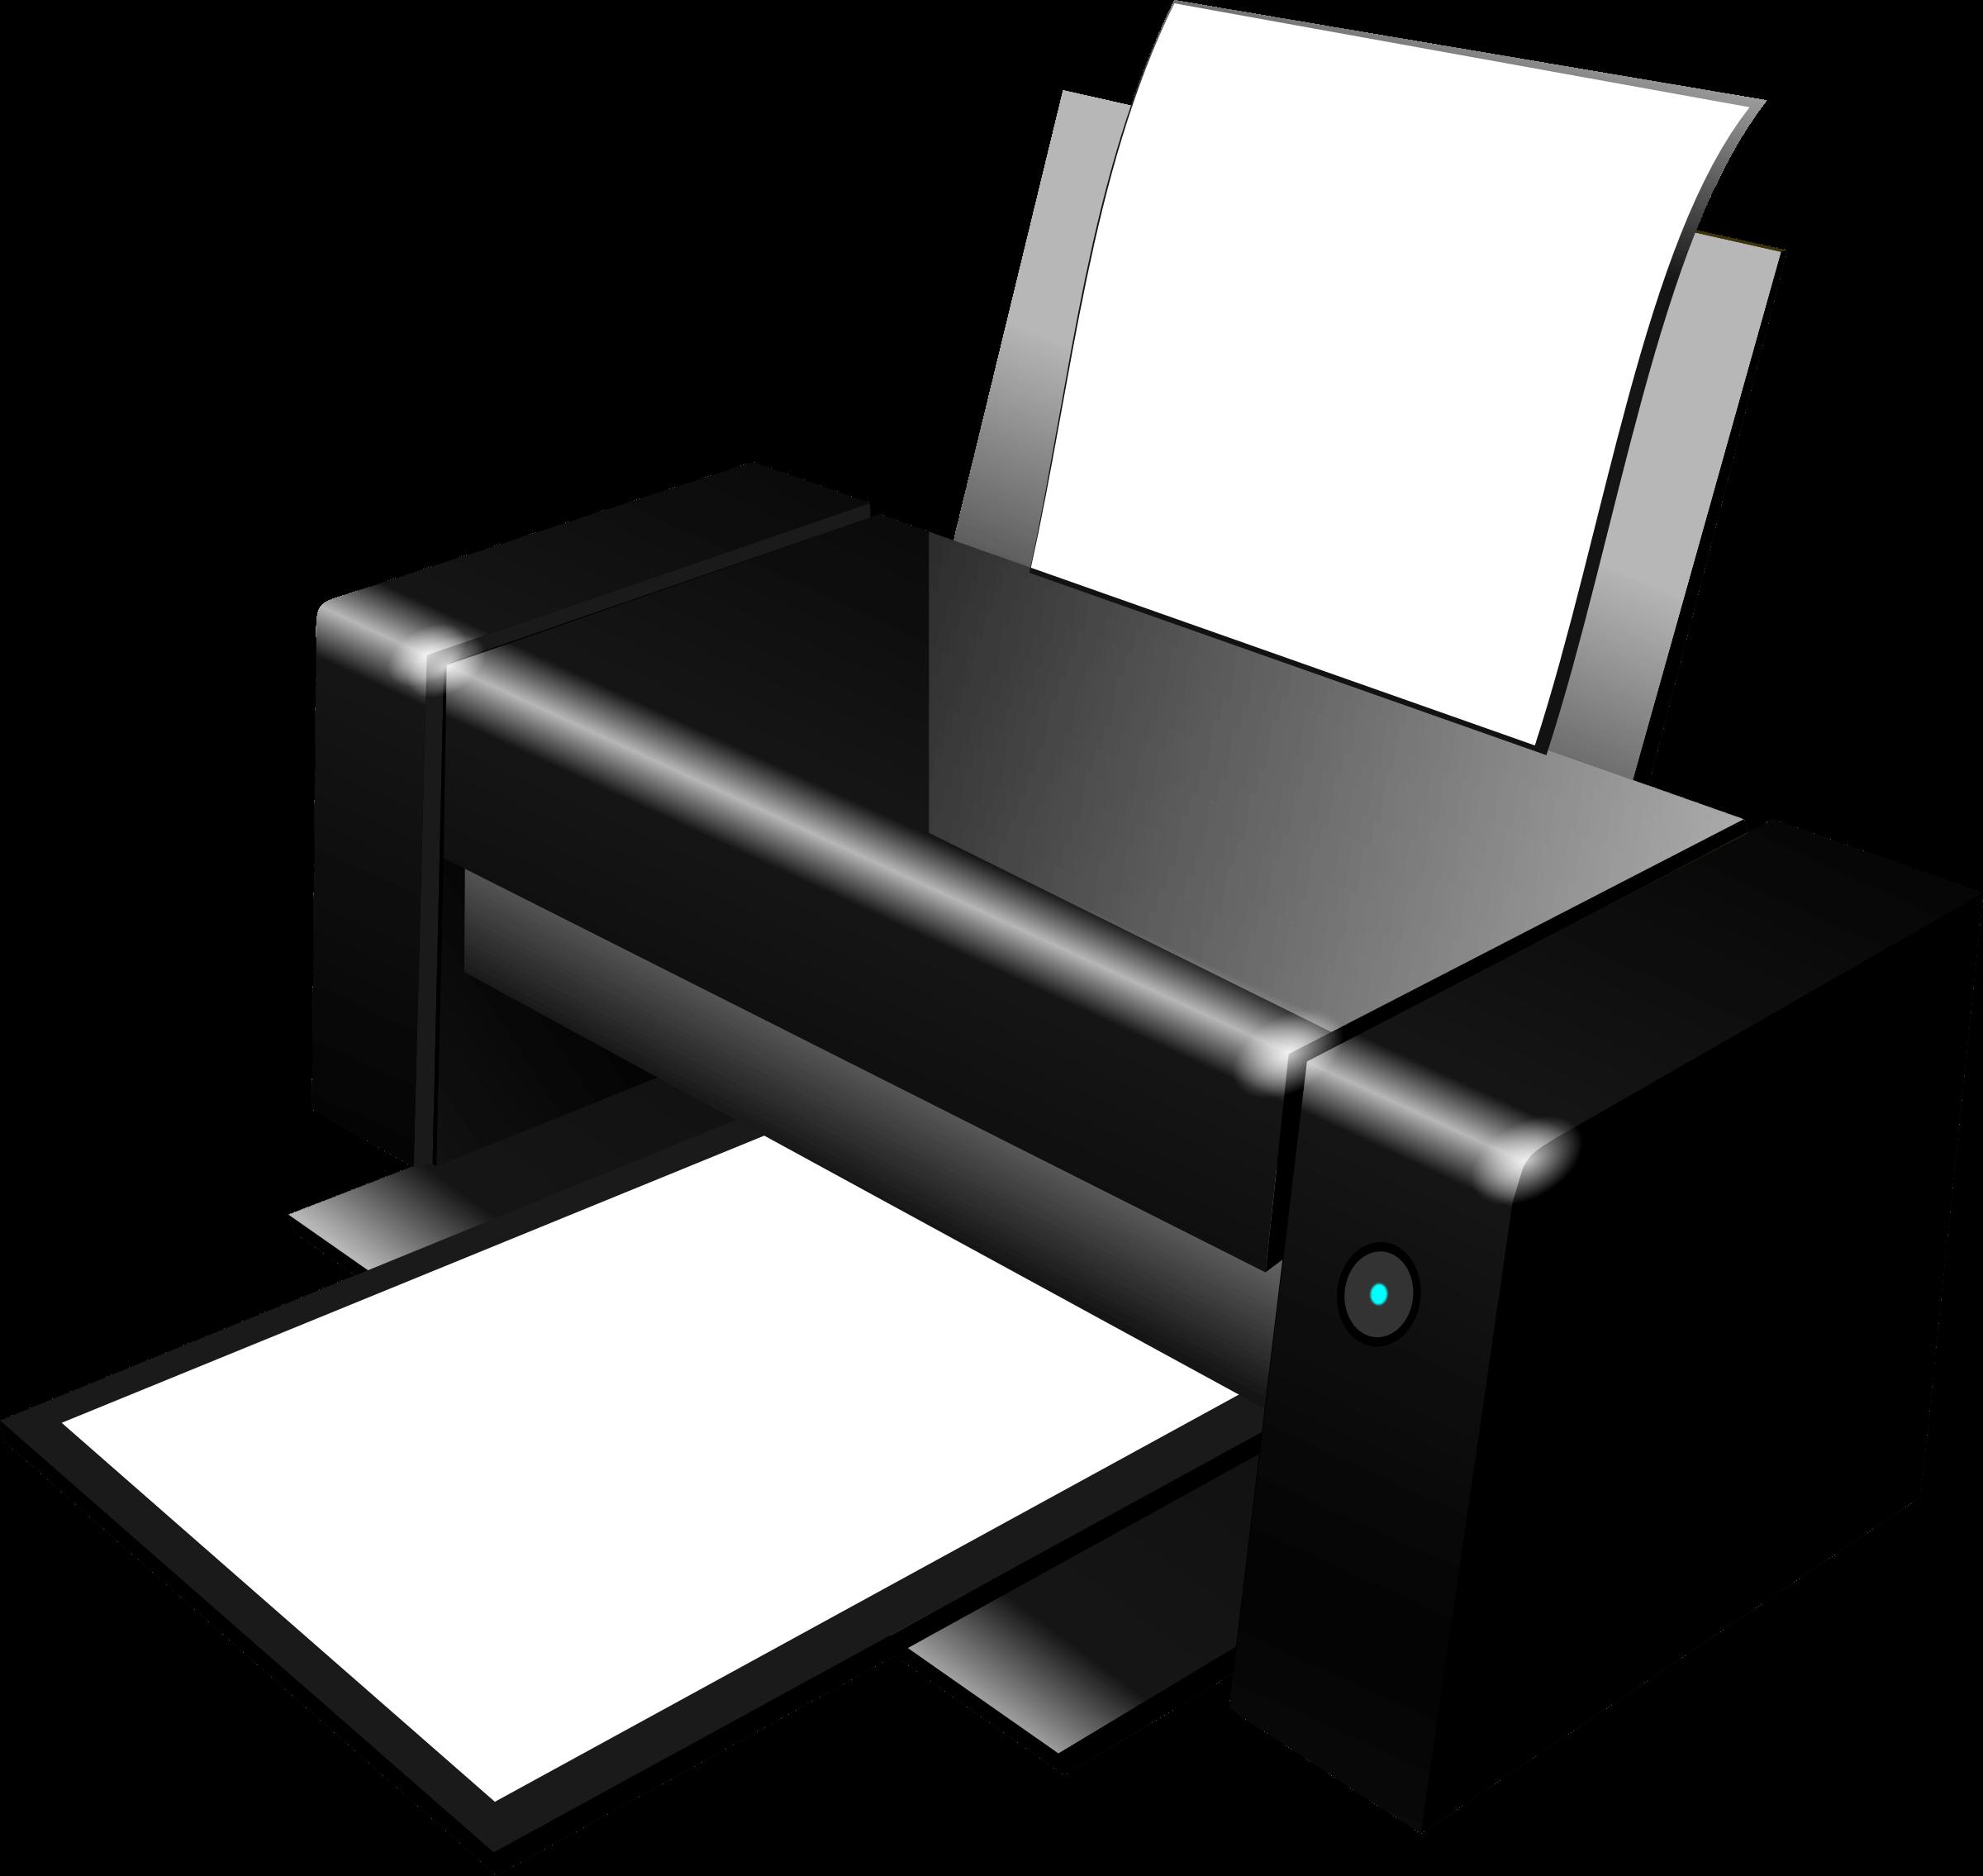 clip art transparent download Printer clipart. Black transparent png stickpng.